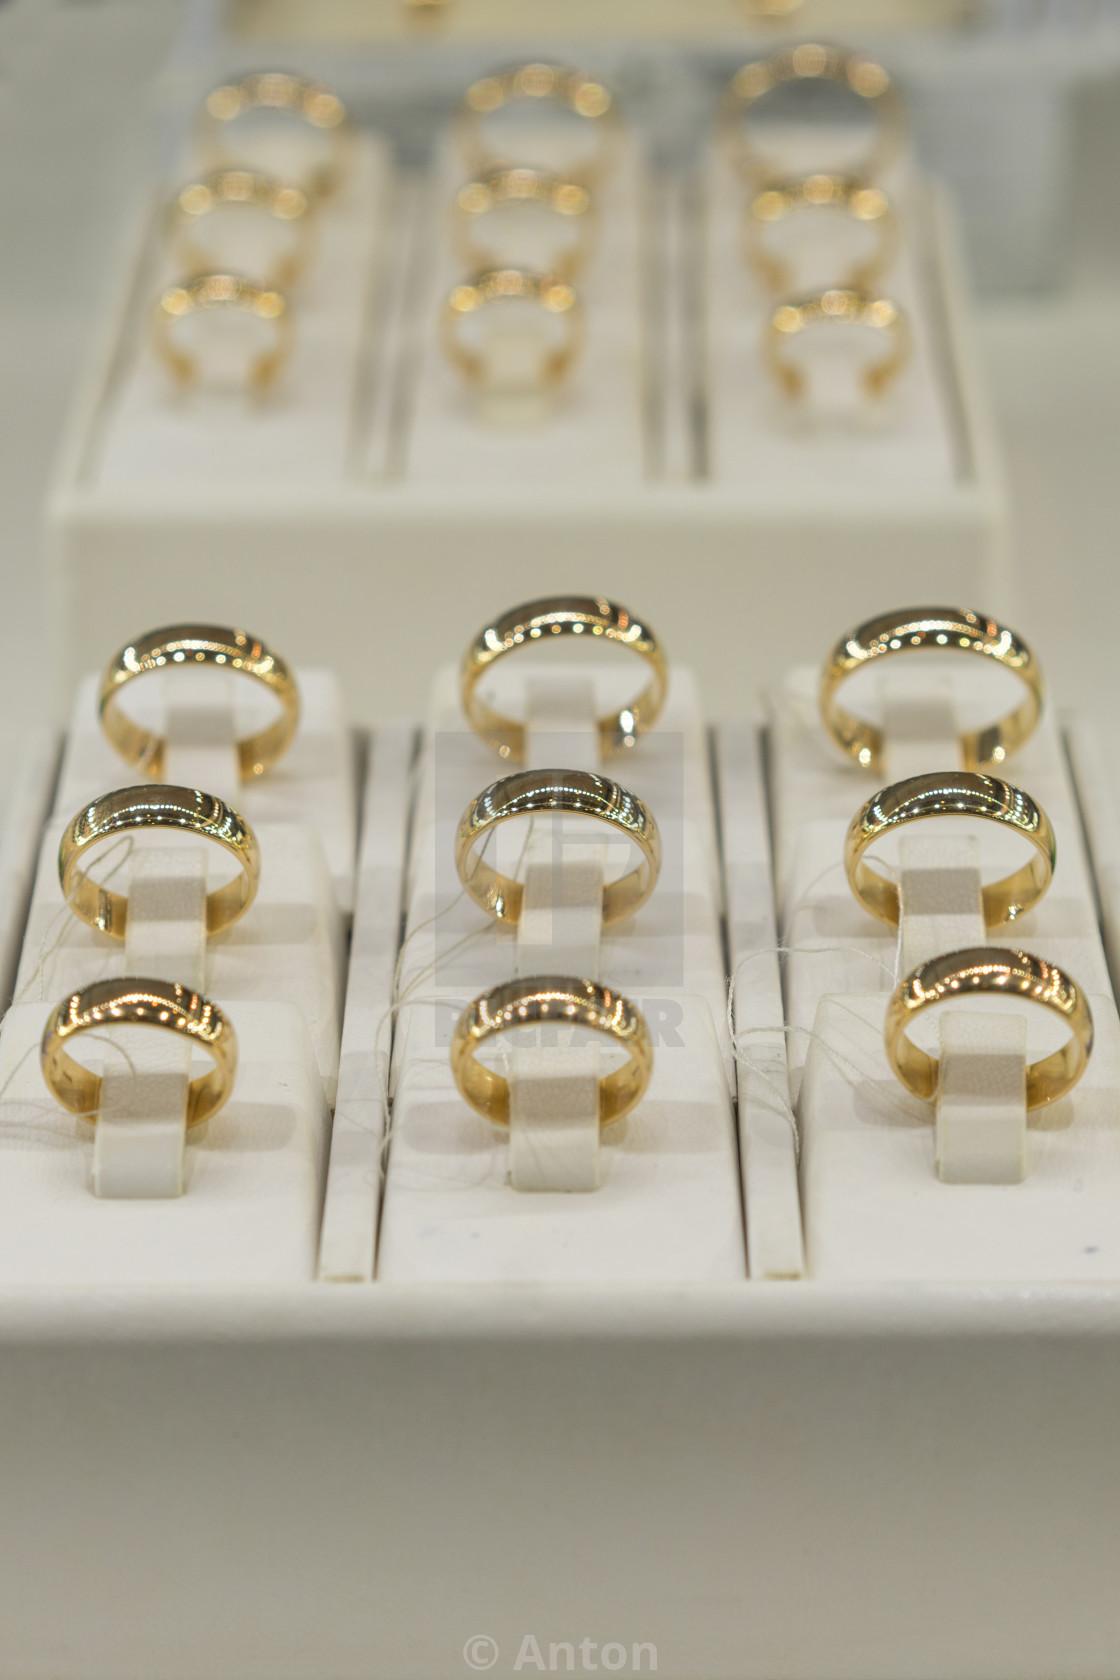 b64f97cf0b495 golden rings store. Wedding gold rings on the showcase. Wedding ring ...